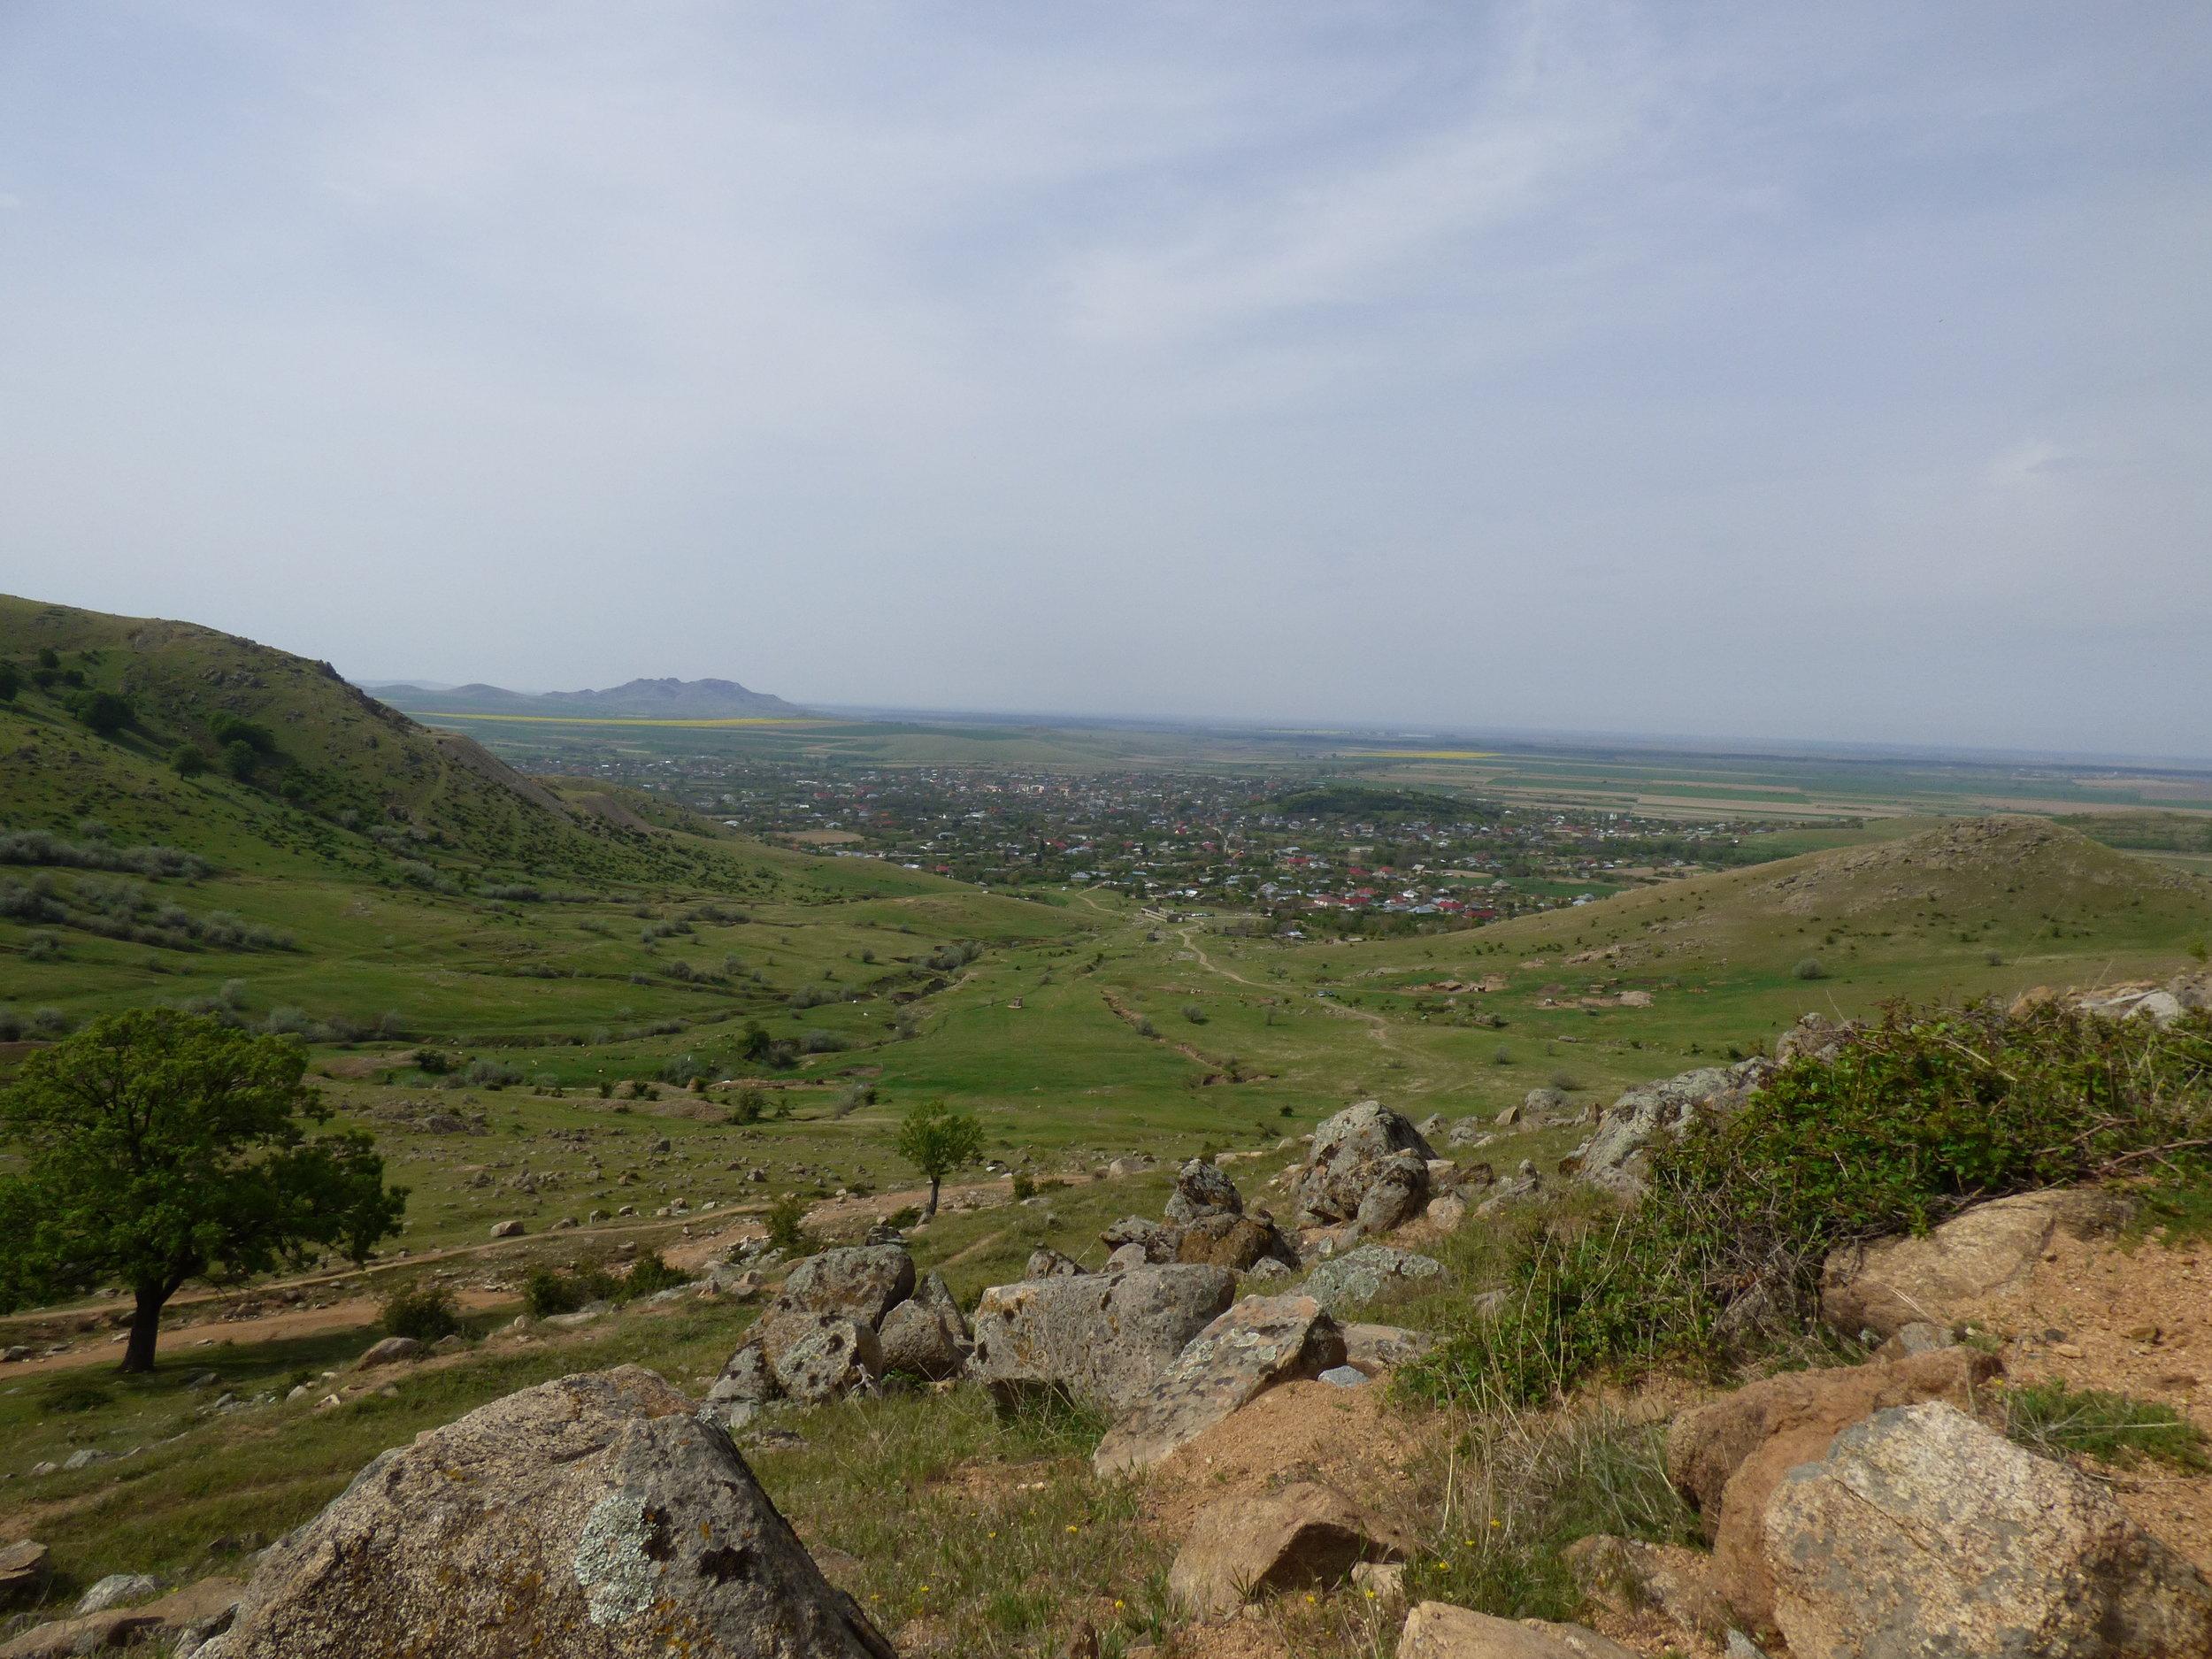 View of Greci from Tugulea Peak in Macin Mountains Romania